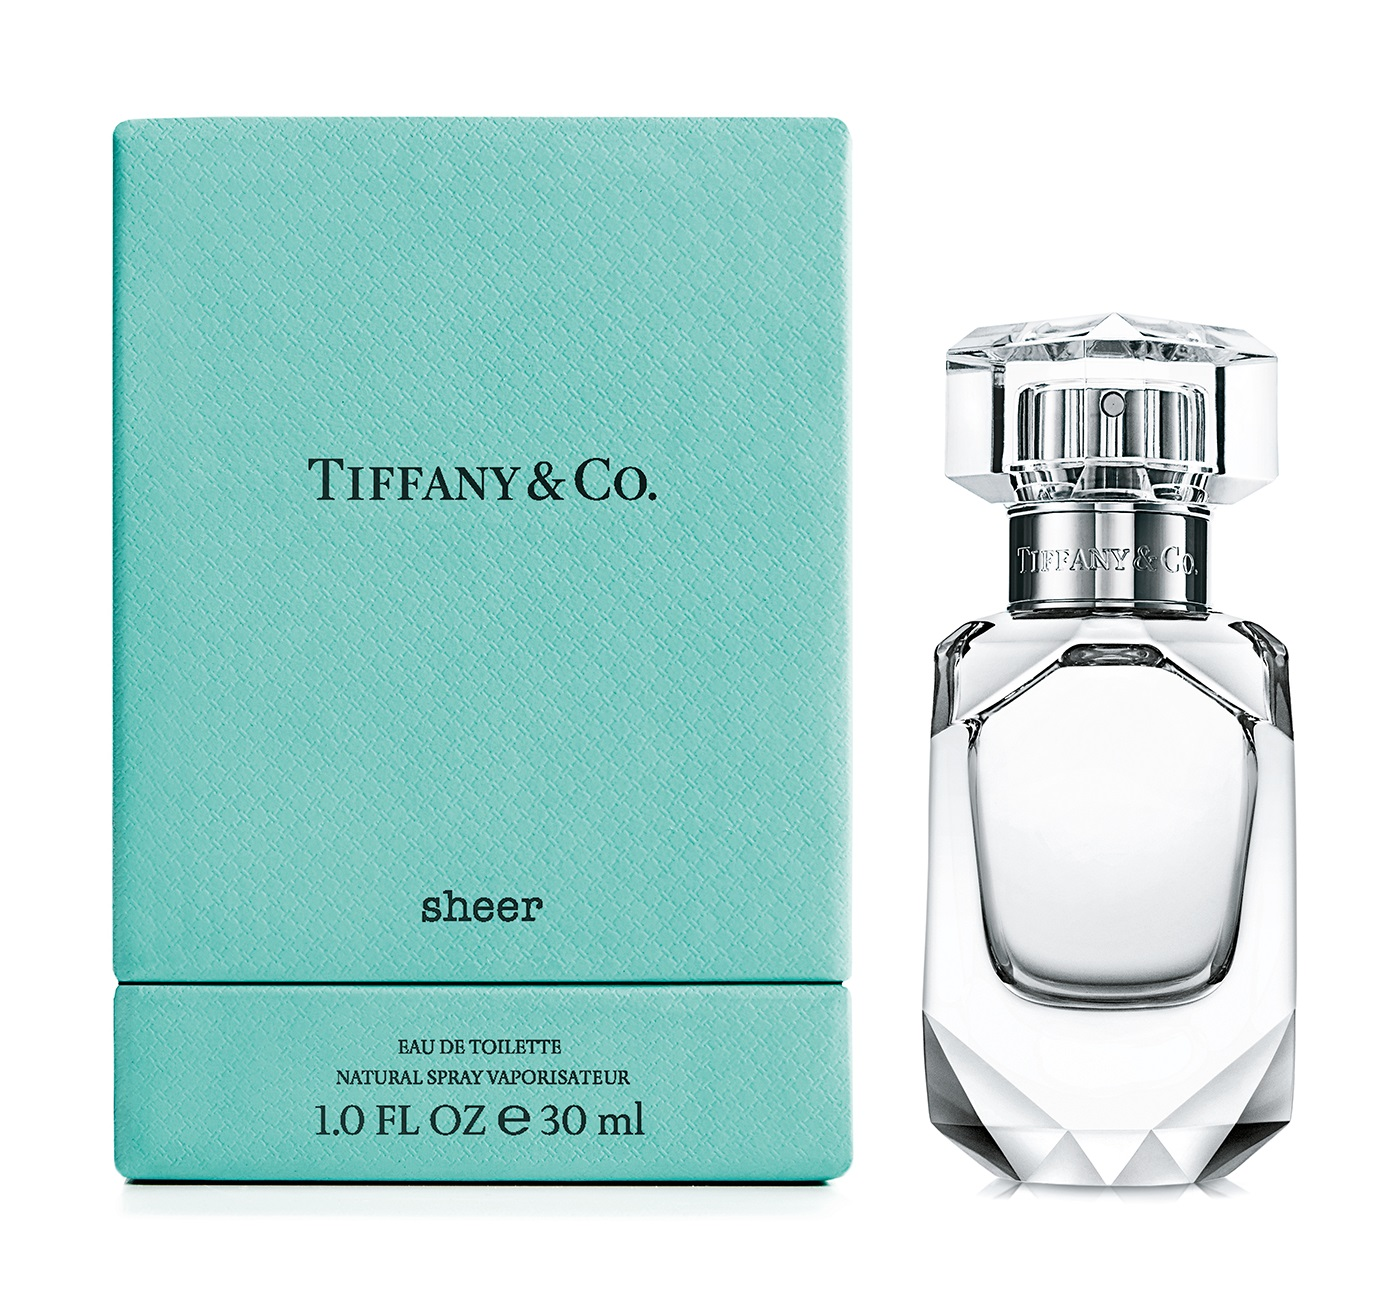 Tiffany & Co Tiffany Sheer  Eau de Toilette